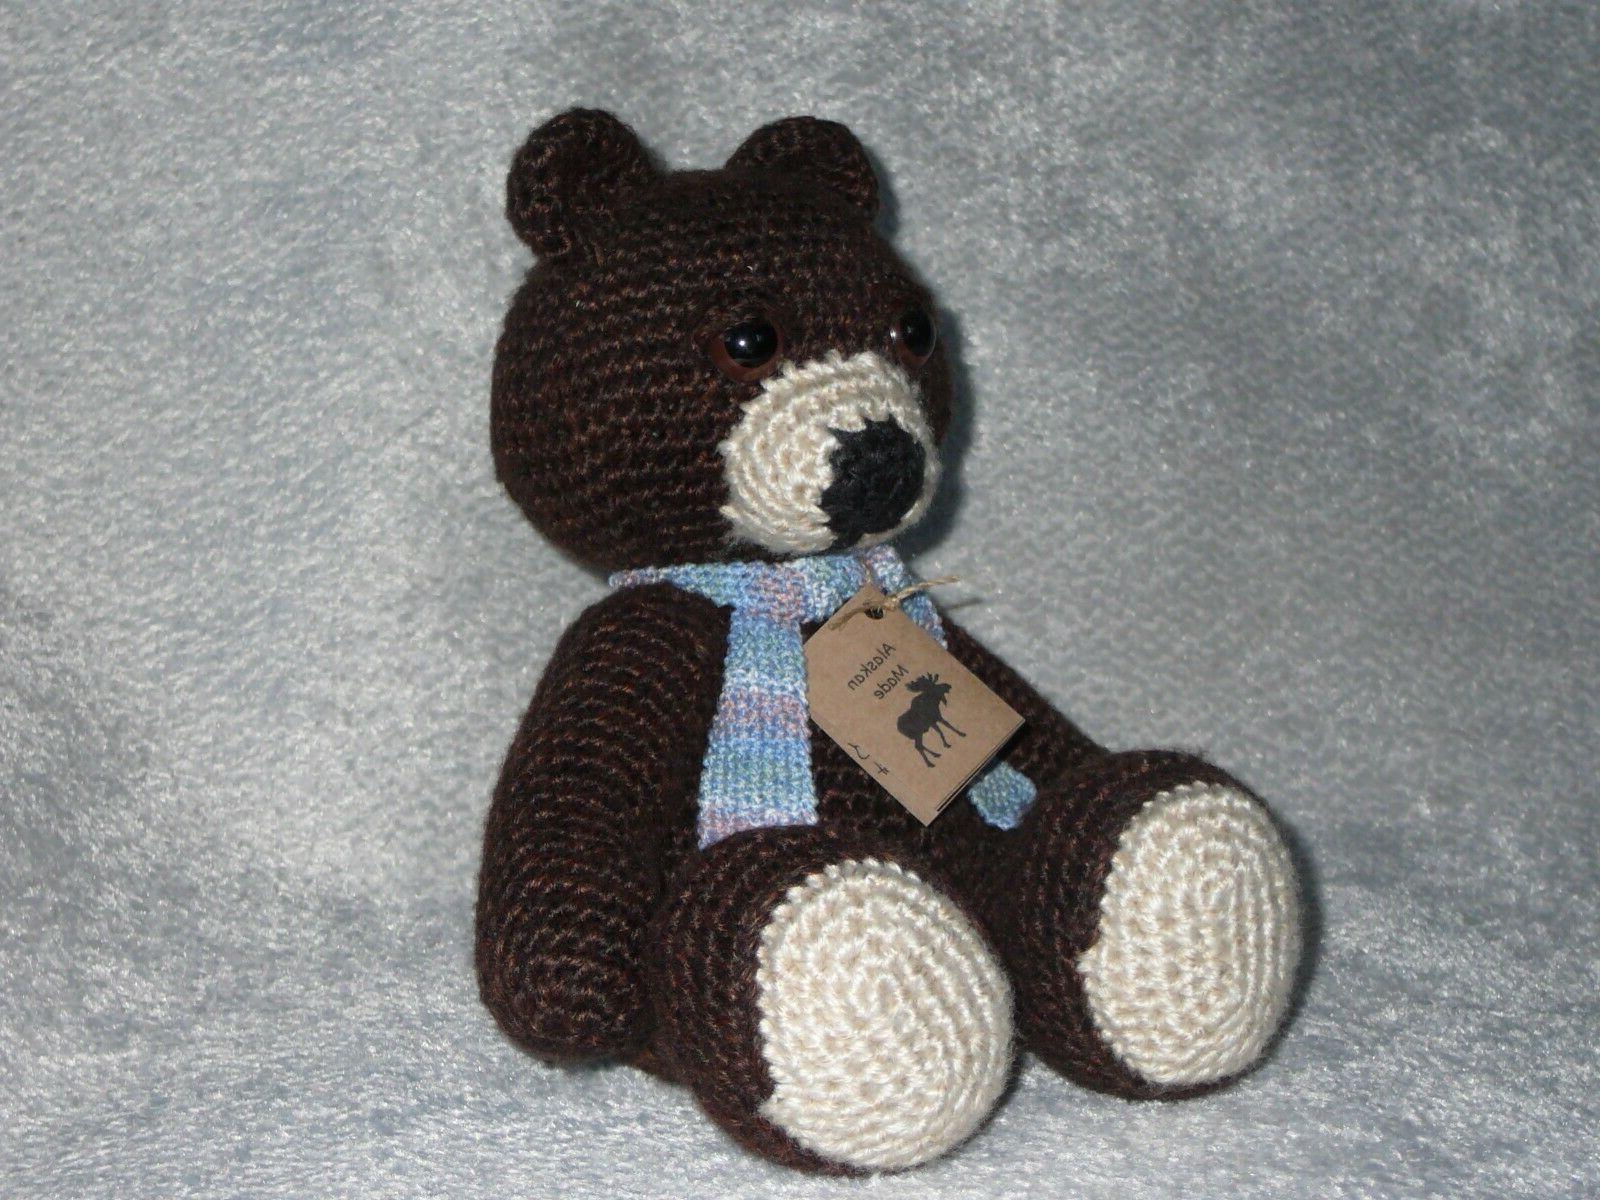 hand crocheted teddy bear hand made in